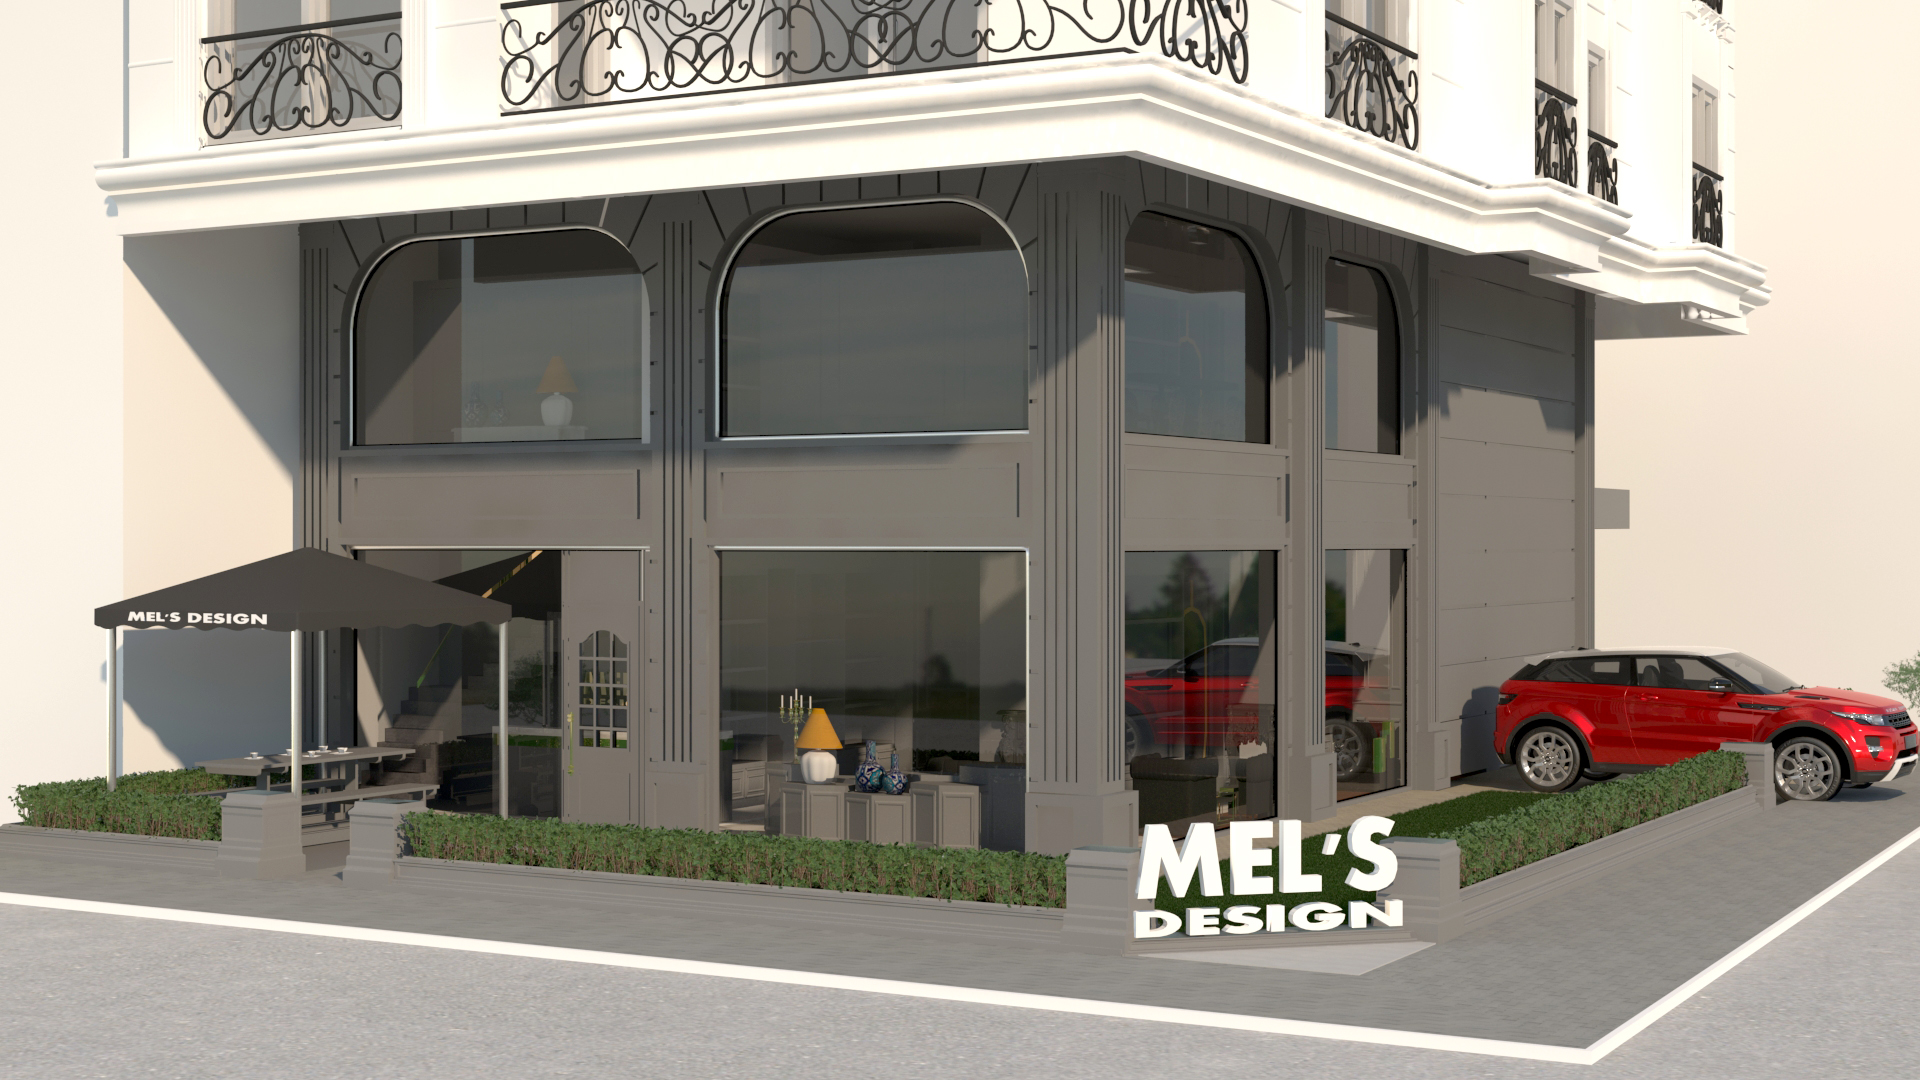 Mel's Design